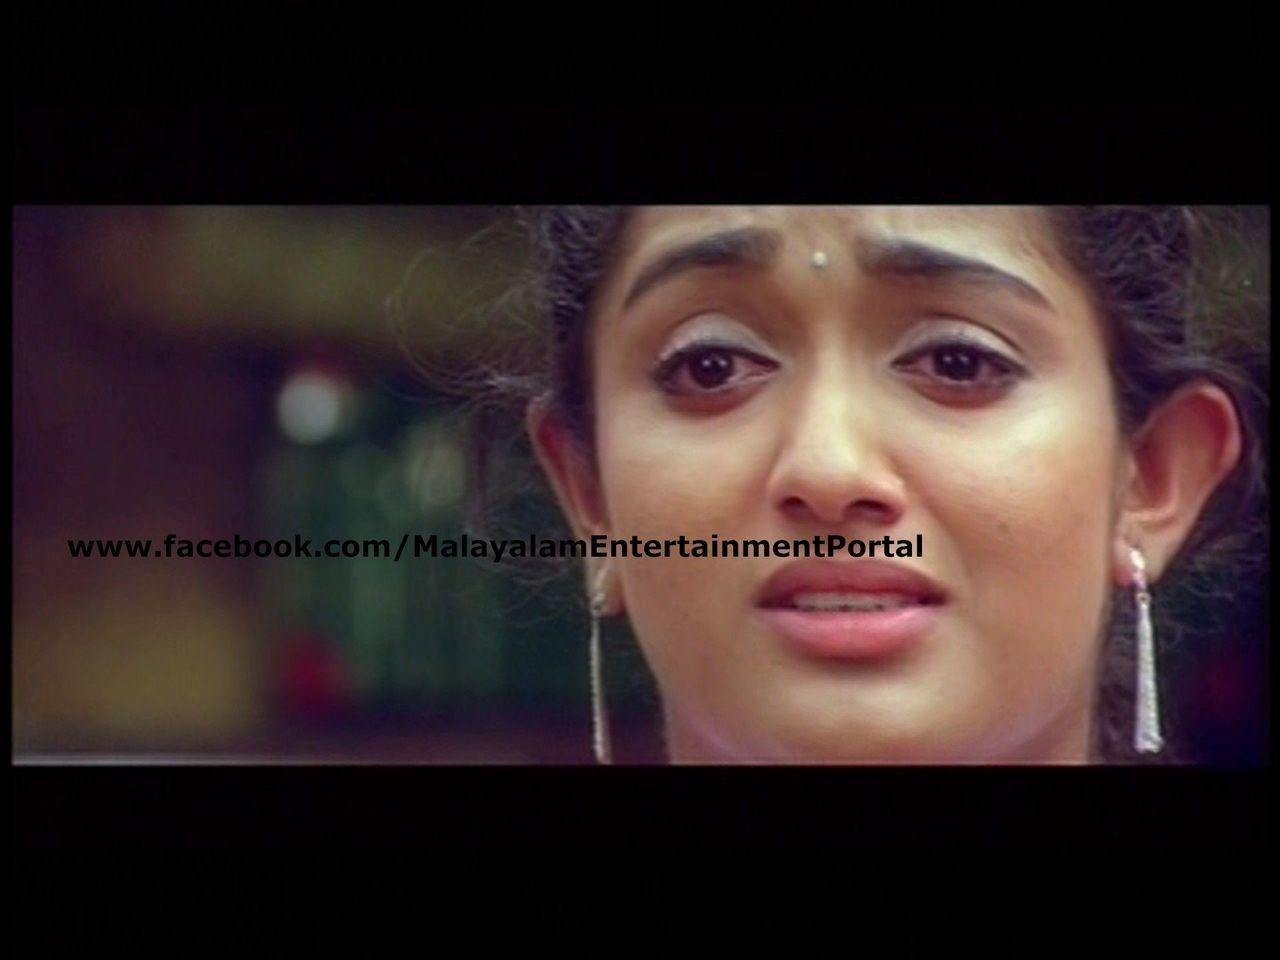 Rakshasarajavu DVD Screenshots (Saina) Bscap0022